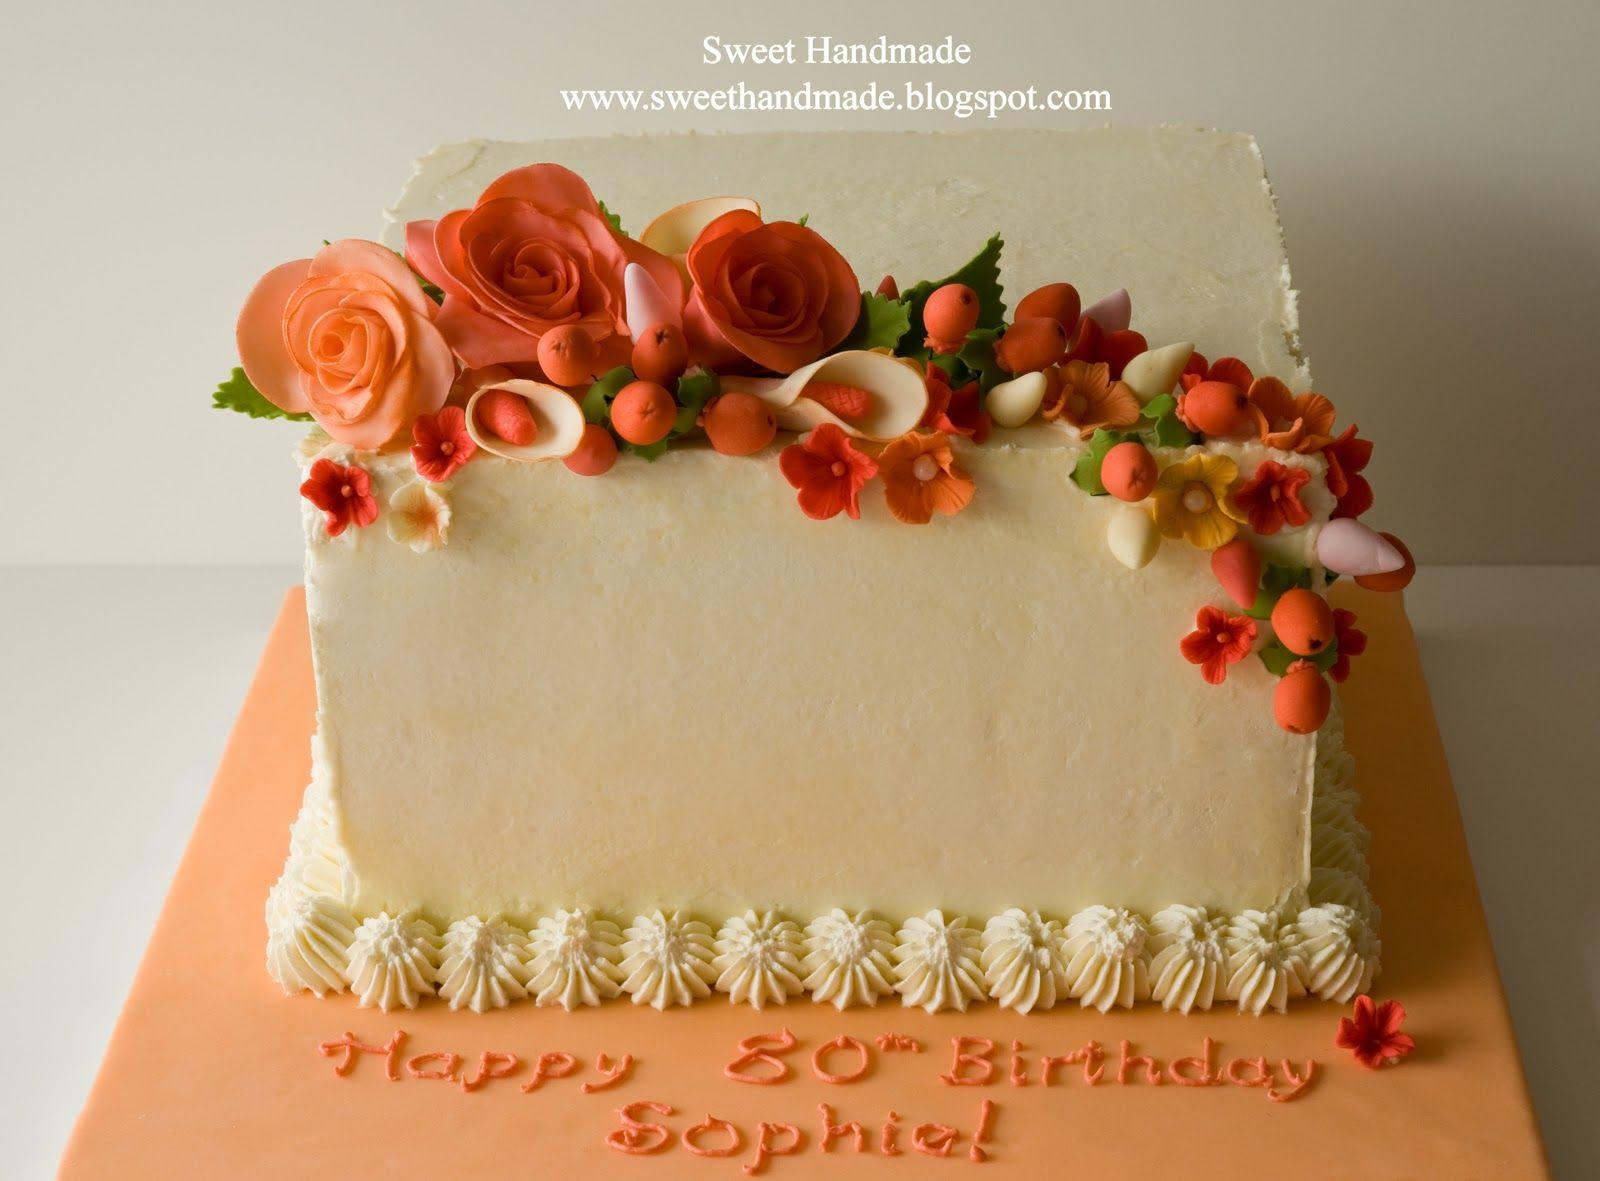 80th birthday ideas for her 80th birthday cake with gum paste 80th birthday ideas for her 80th birthday cake with gum paste flowers izmirmasajfo Images